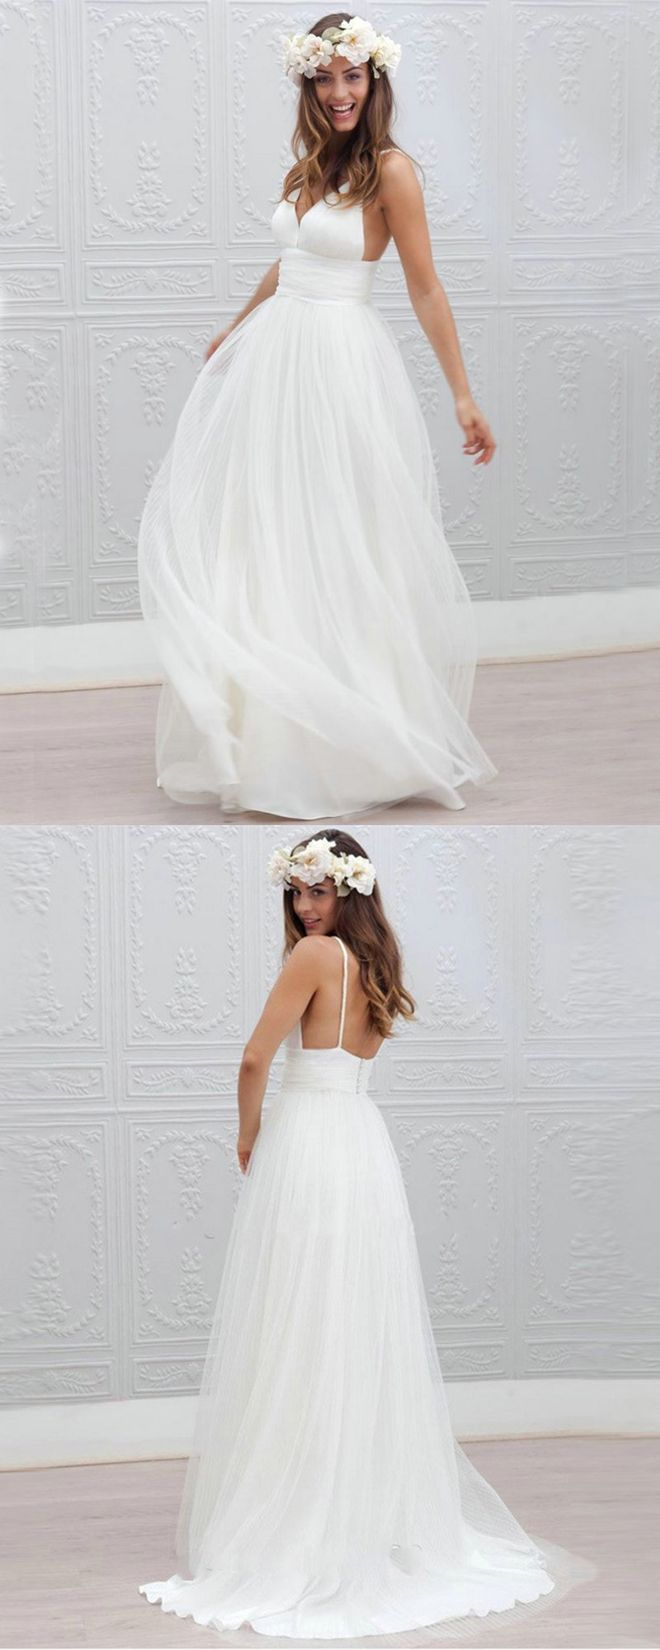 Top 25+ best White wedding dresses ideas on Pinterest | Lace top ...